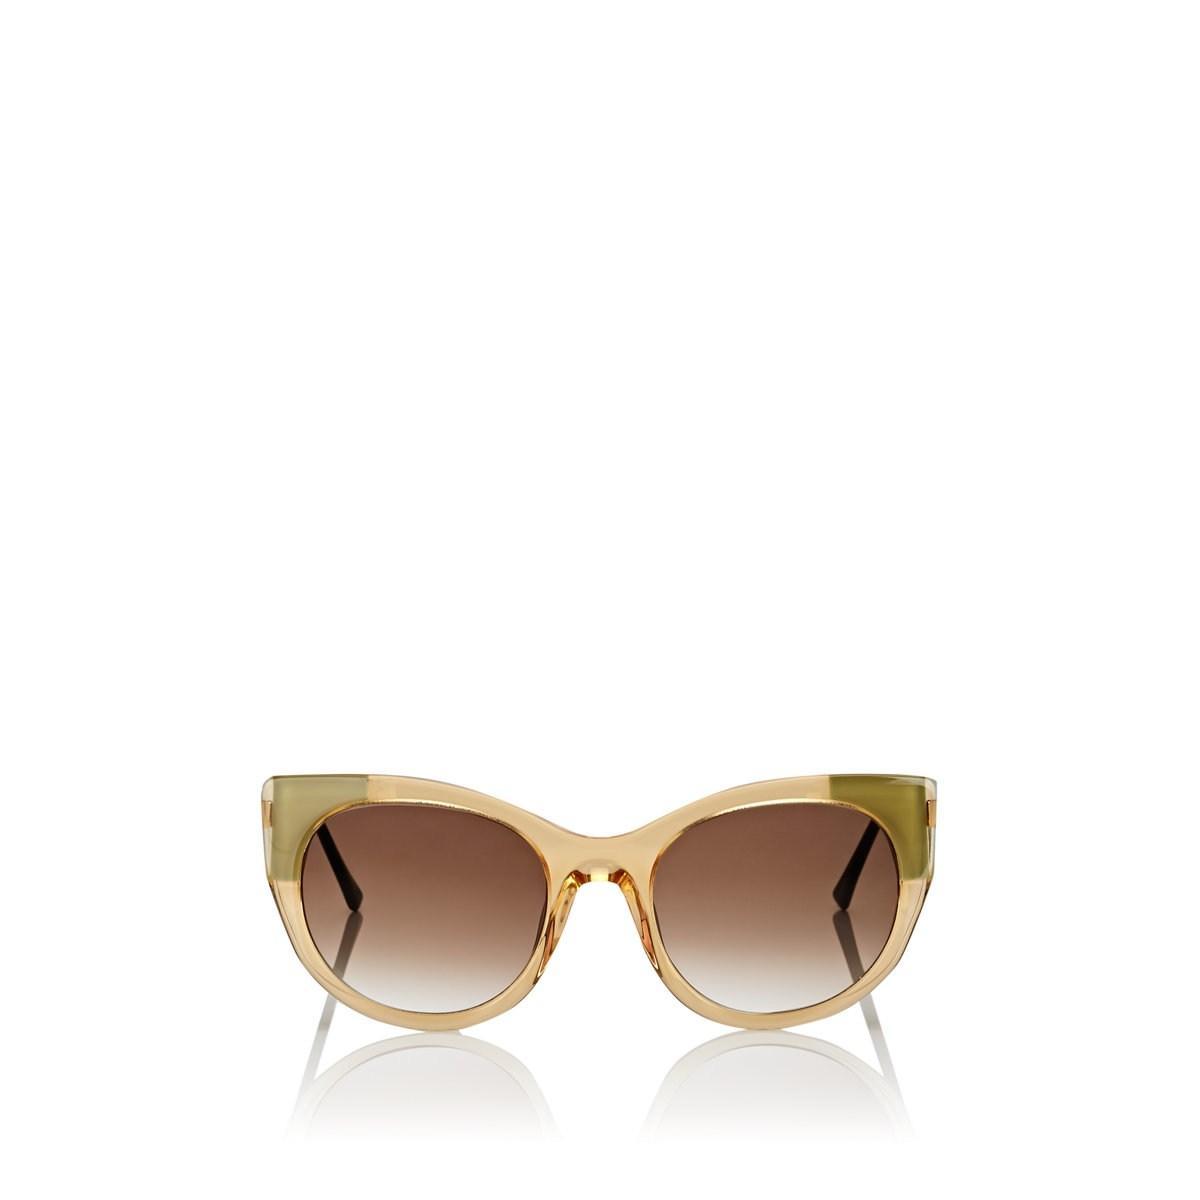 8423712eca Lyst - Thierry Lasry Bunny Sunglasses in Metallic